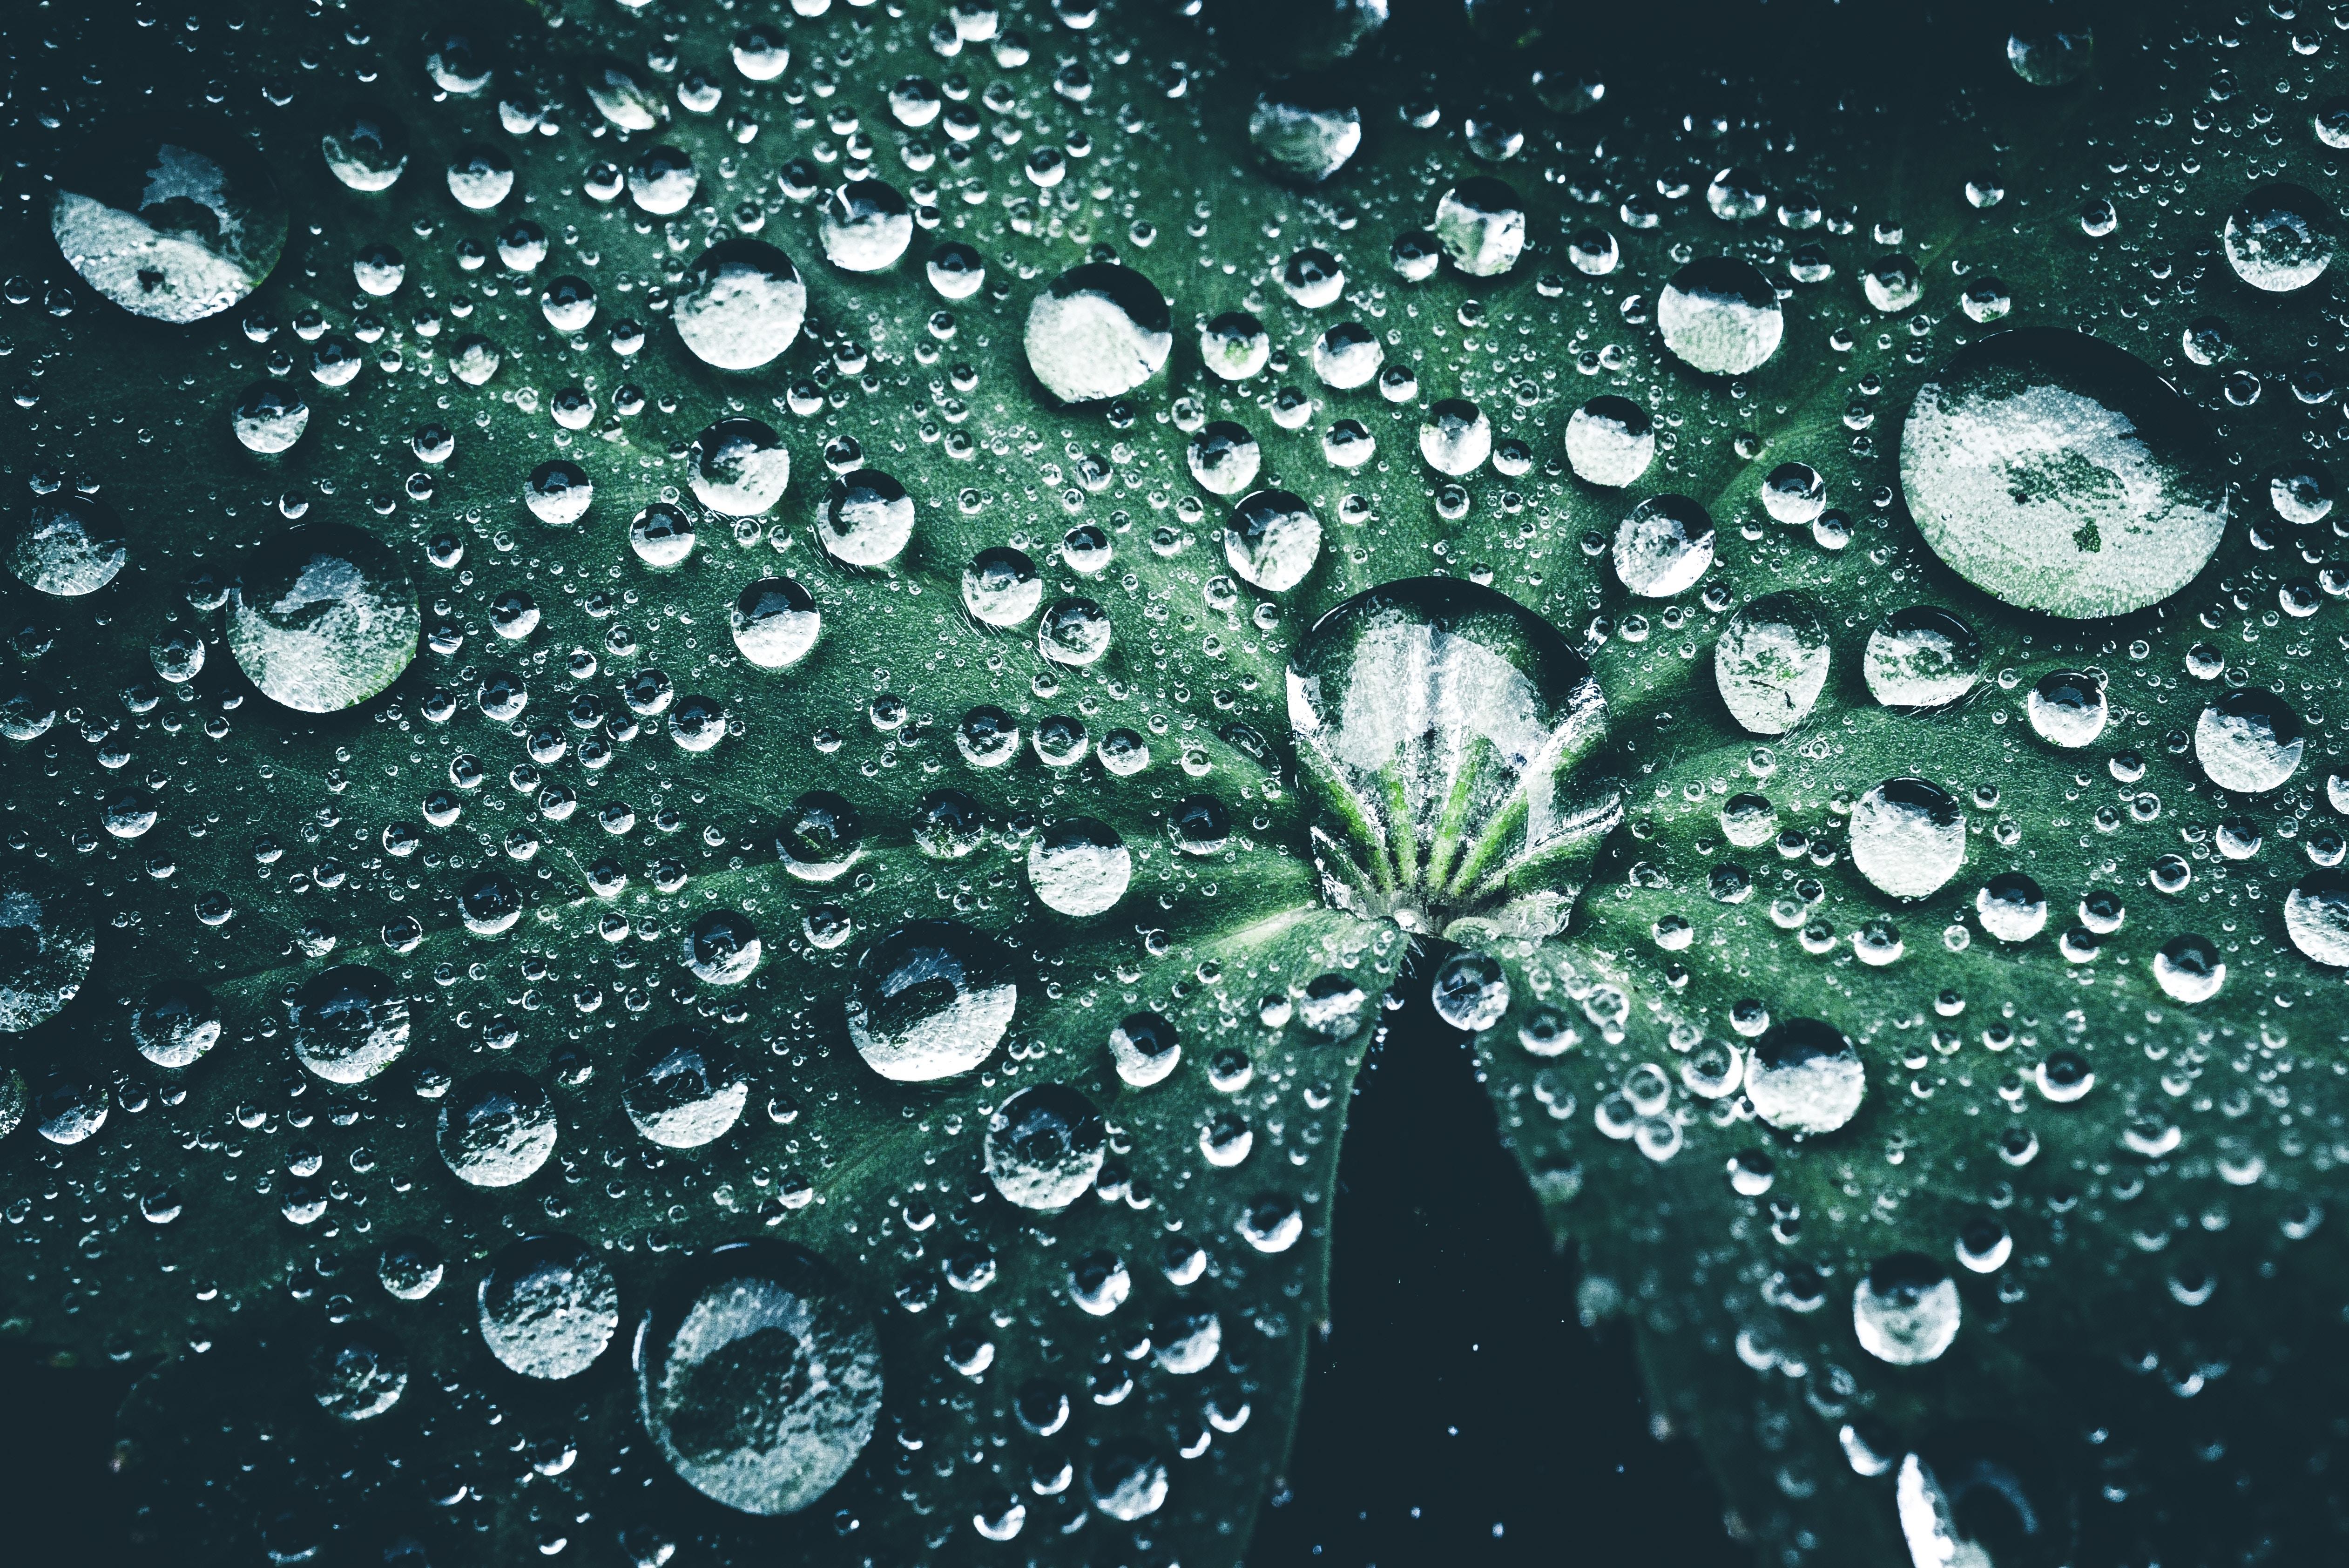 Leaf Macro Nature Water Drop 5046x3368